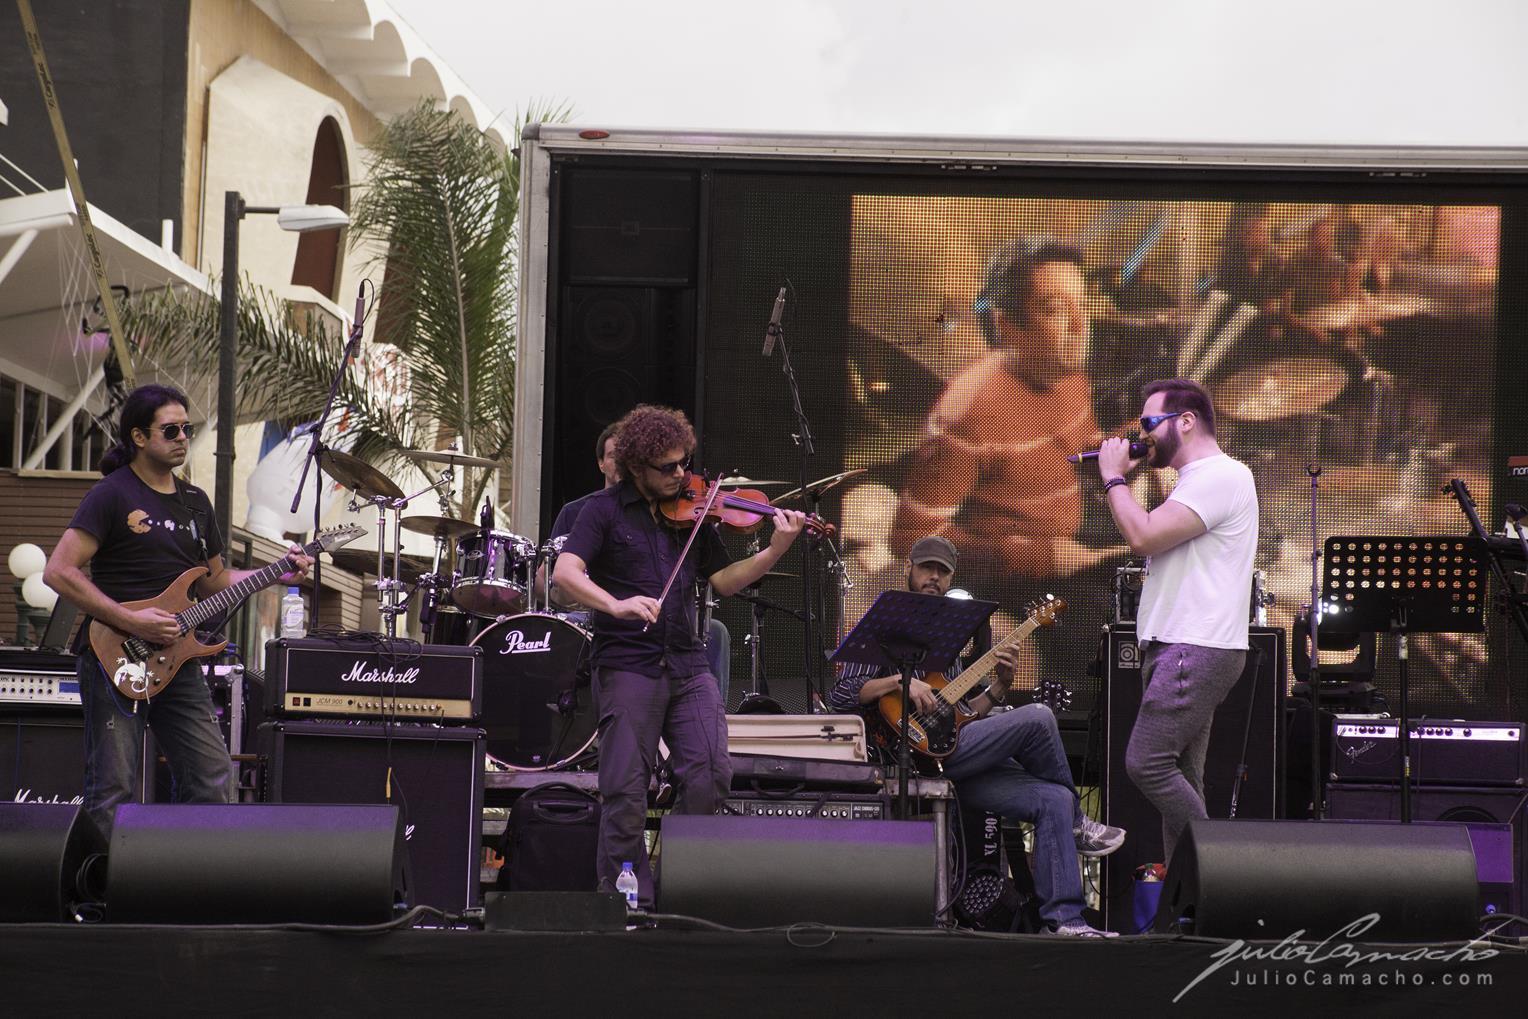 2014-10-30 31 CAST TOUR Ensenada y Tijuana - 1194 - www.Juli (Copy).jpg